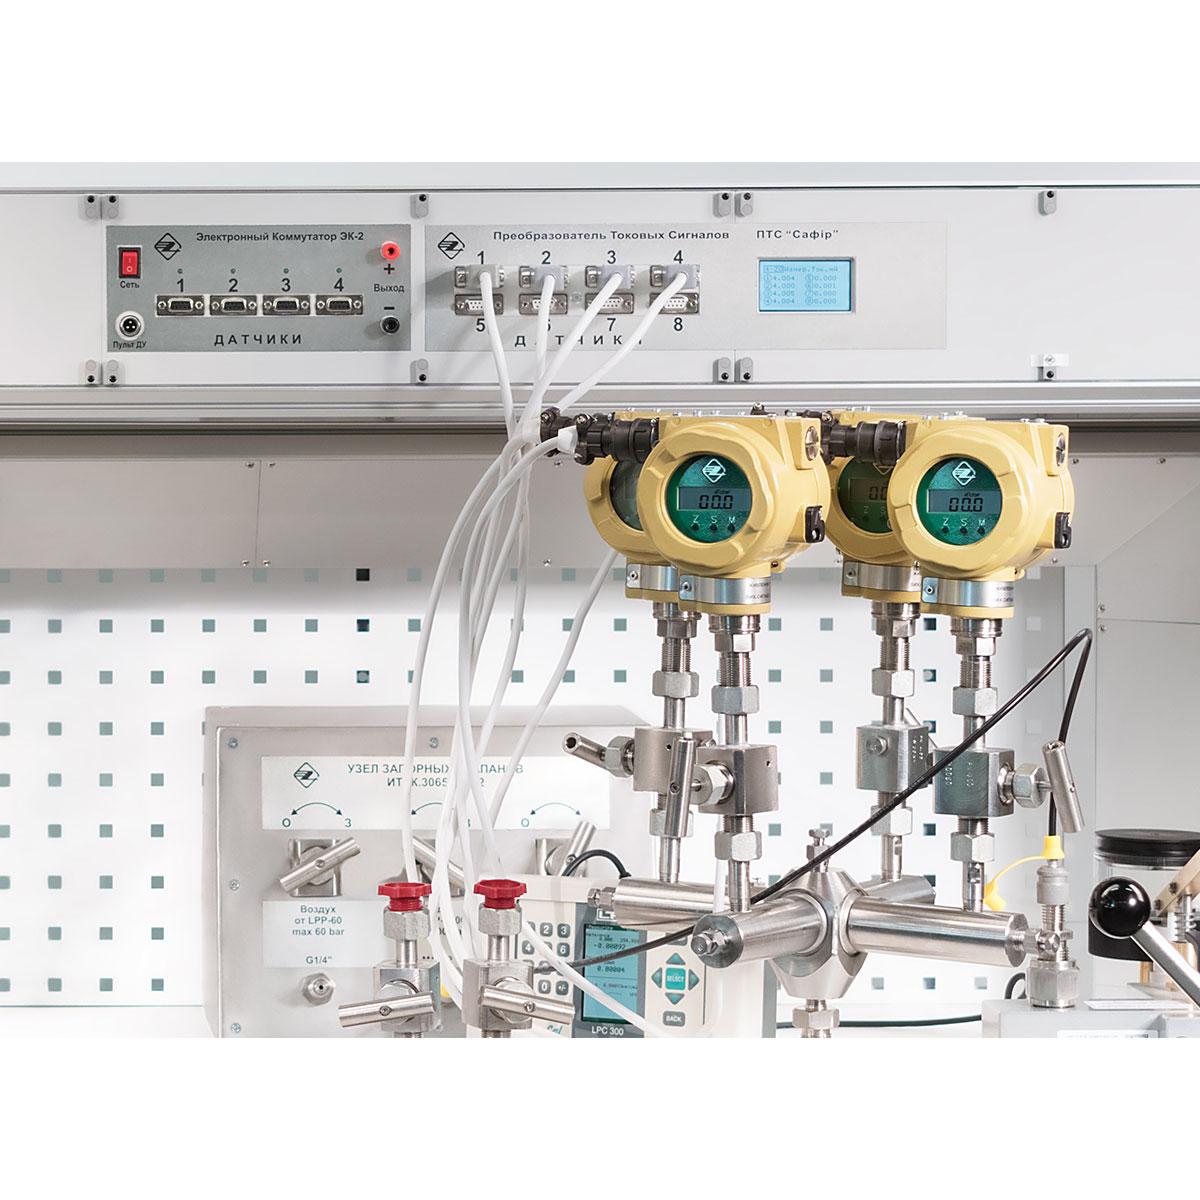 Current signal converter